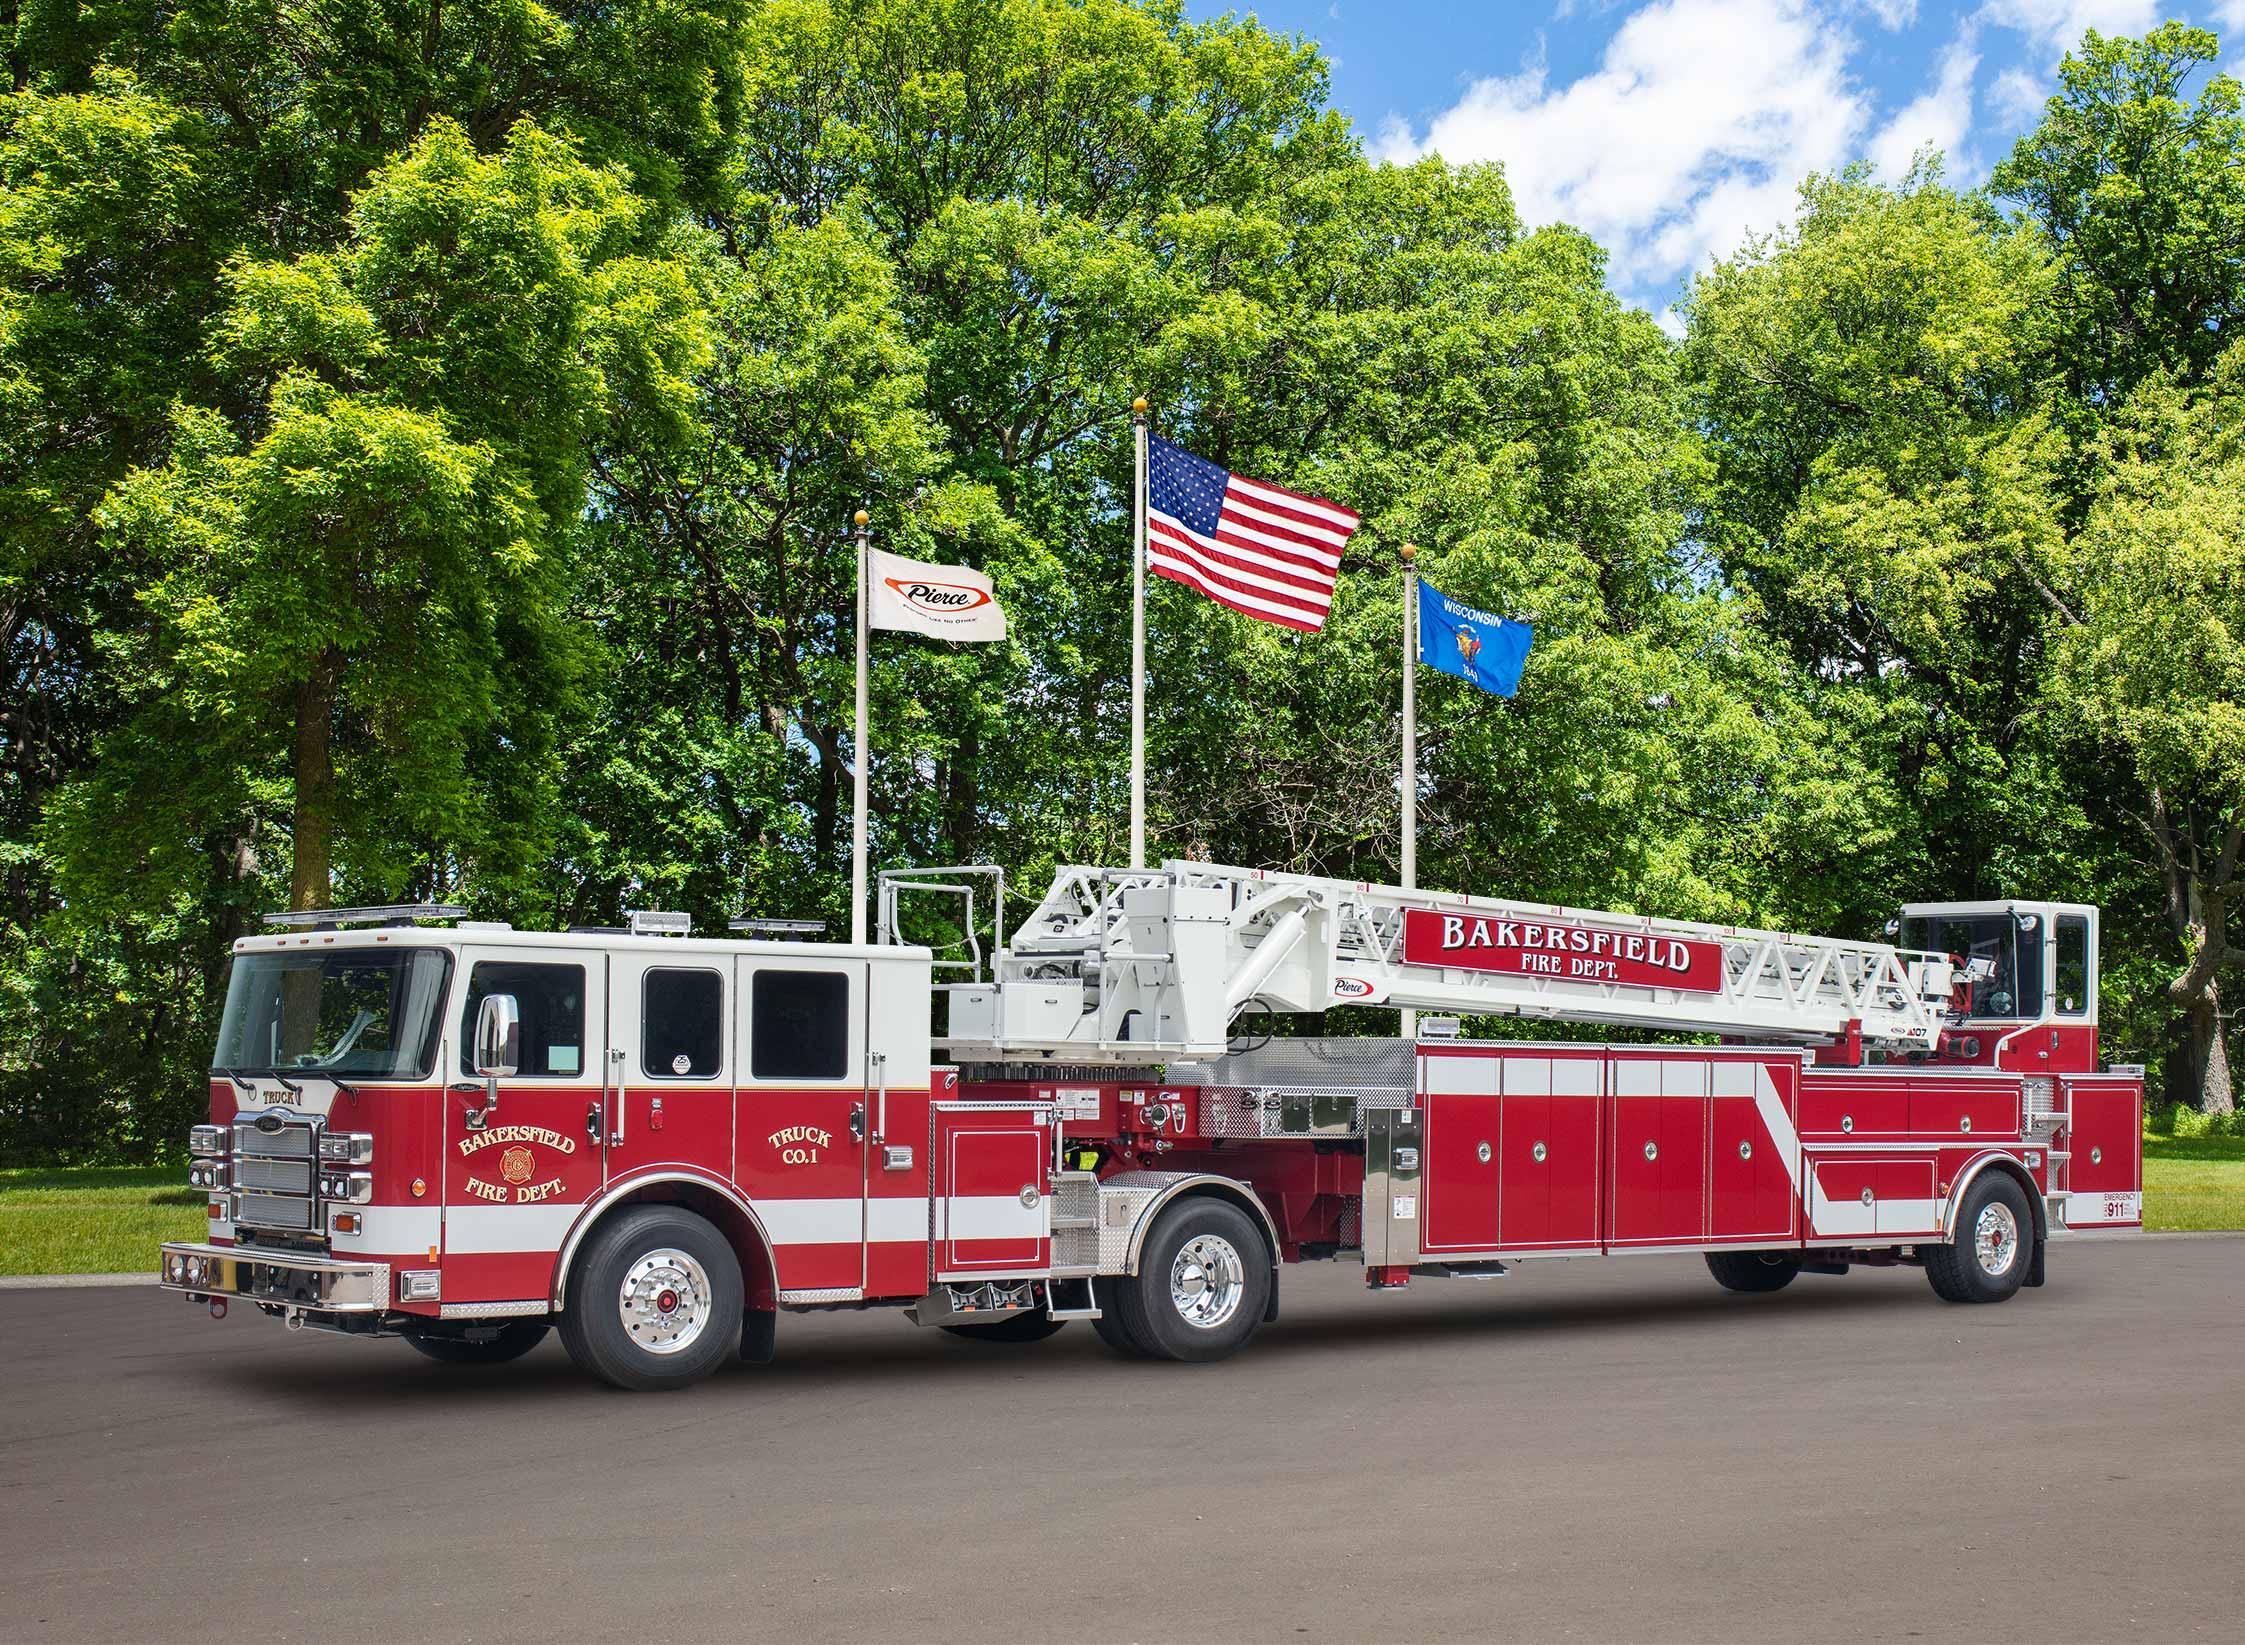 Bakersfield Fire Department - Aerial